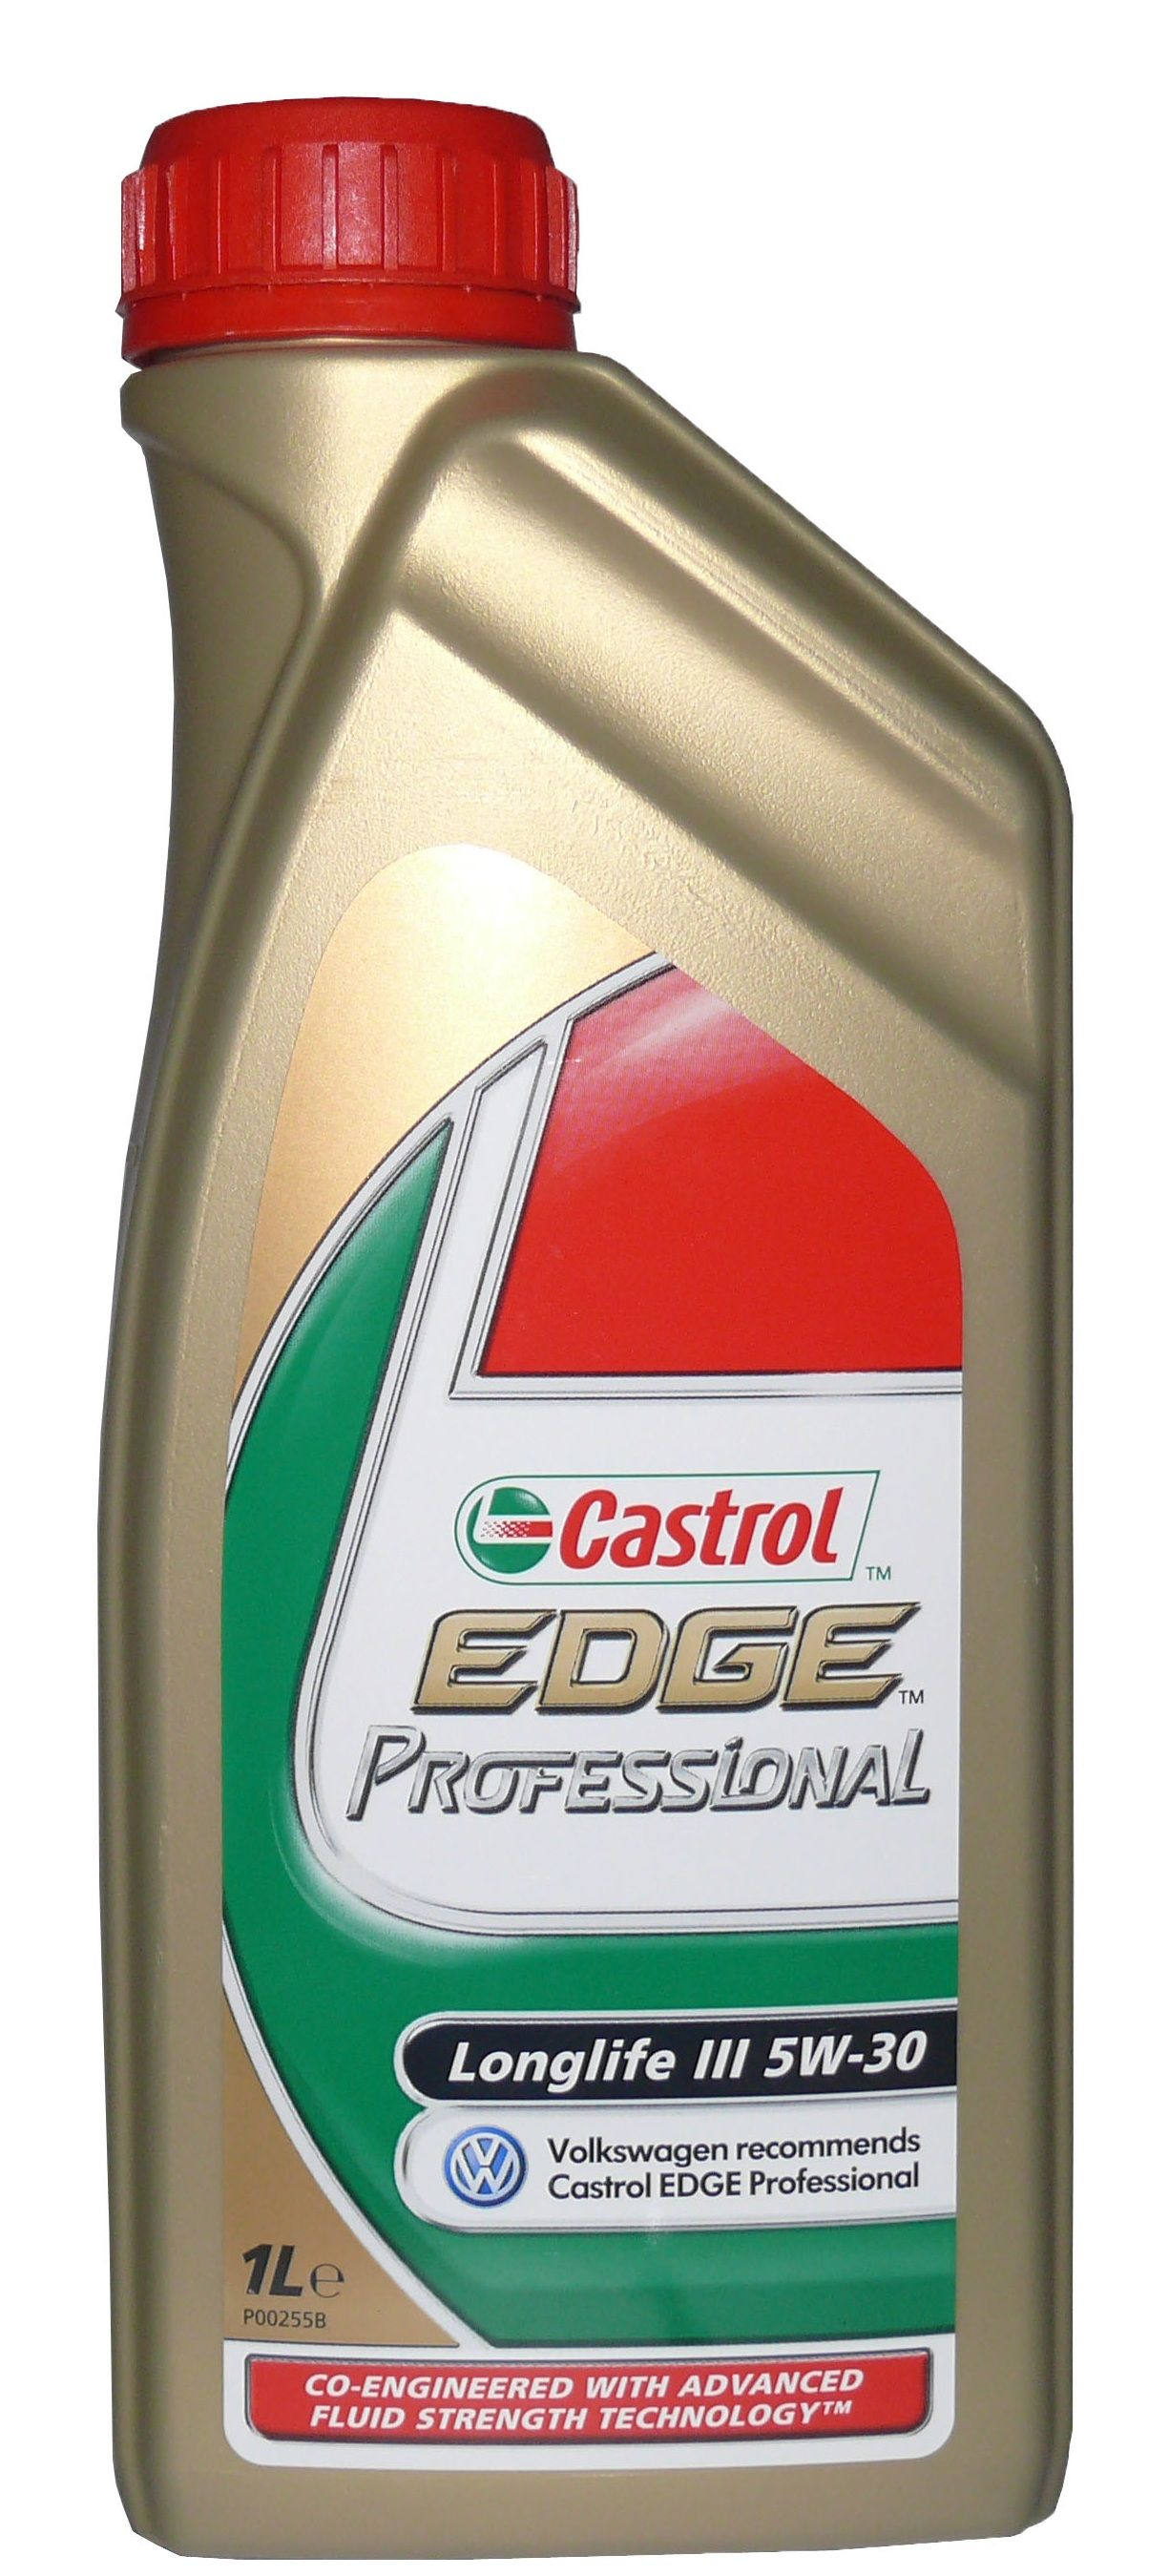 Castrol 5W-30 EDGE Professional Long life III 1L plně syntetický motorový olej 1l